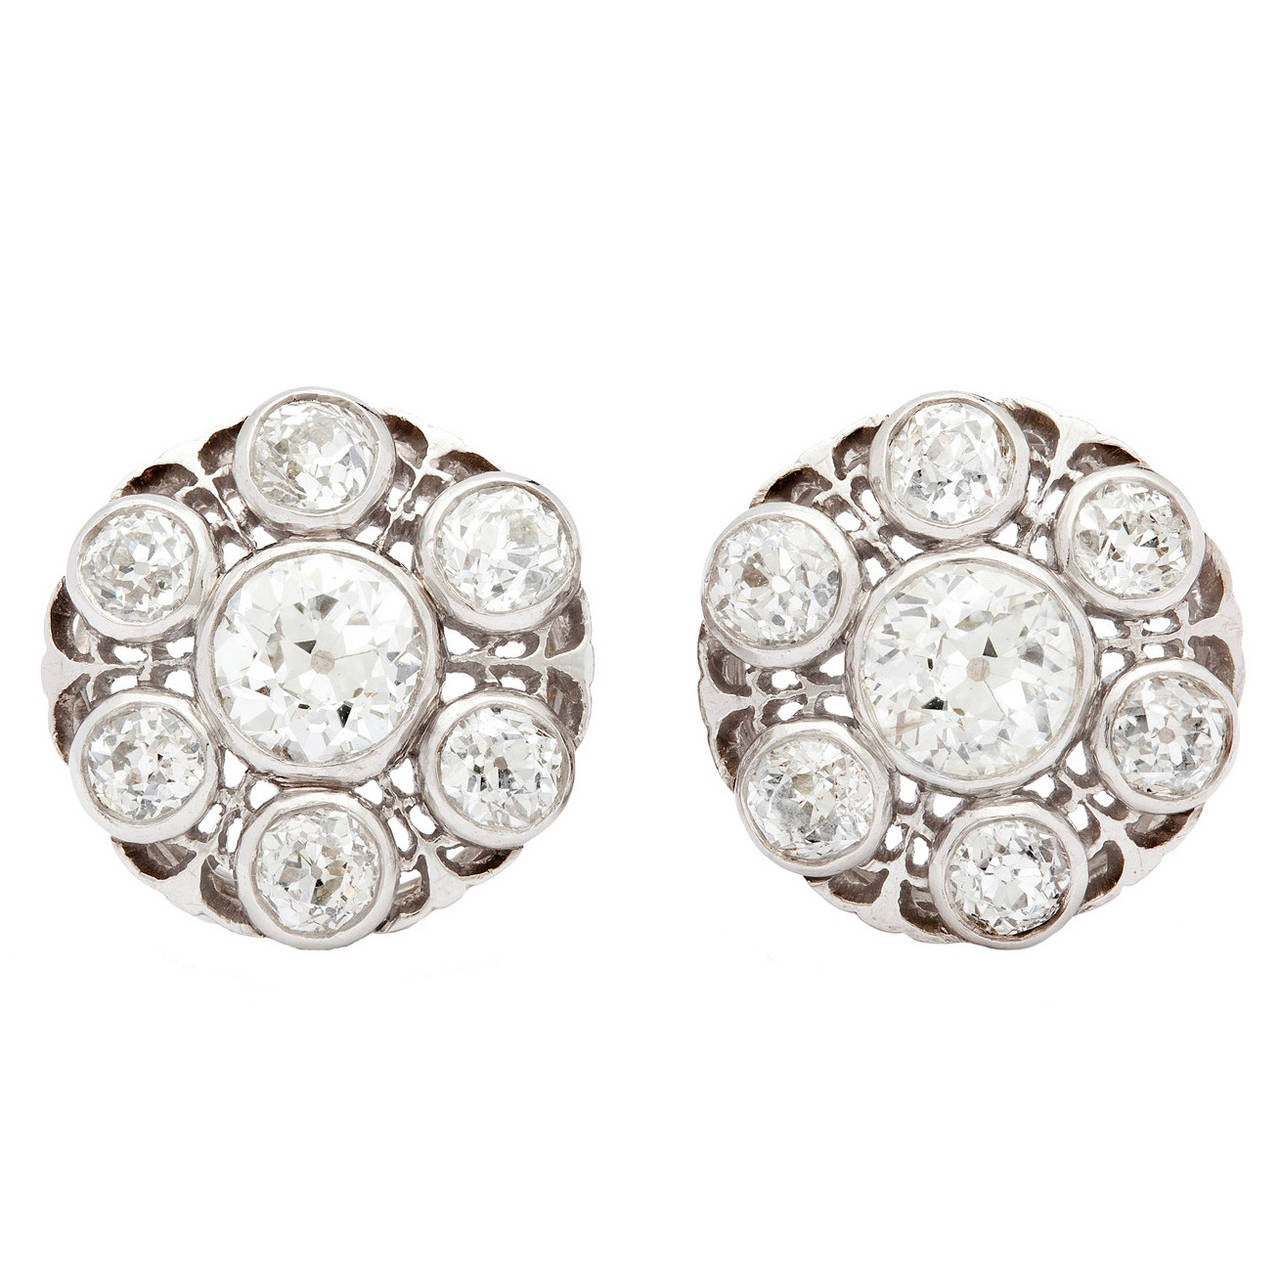 Victorian Old European Cut Diamond Earrings